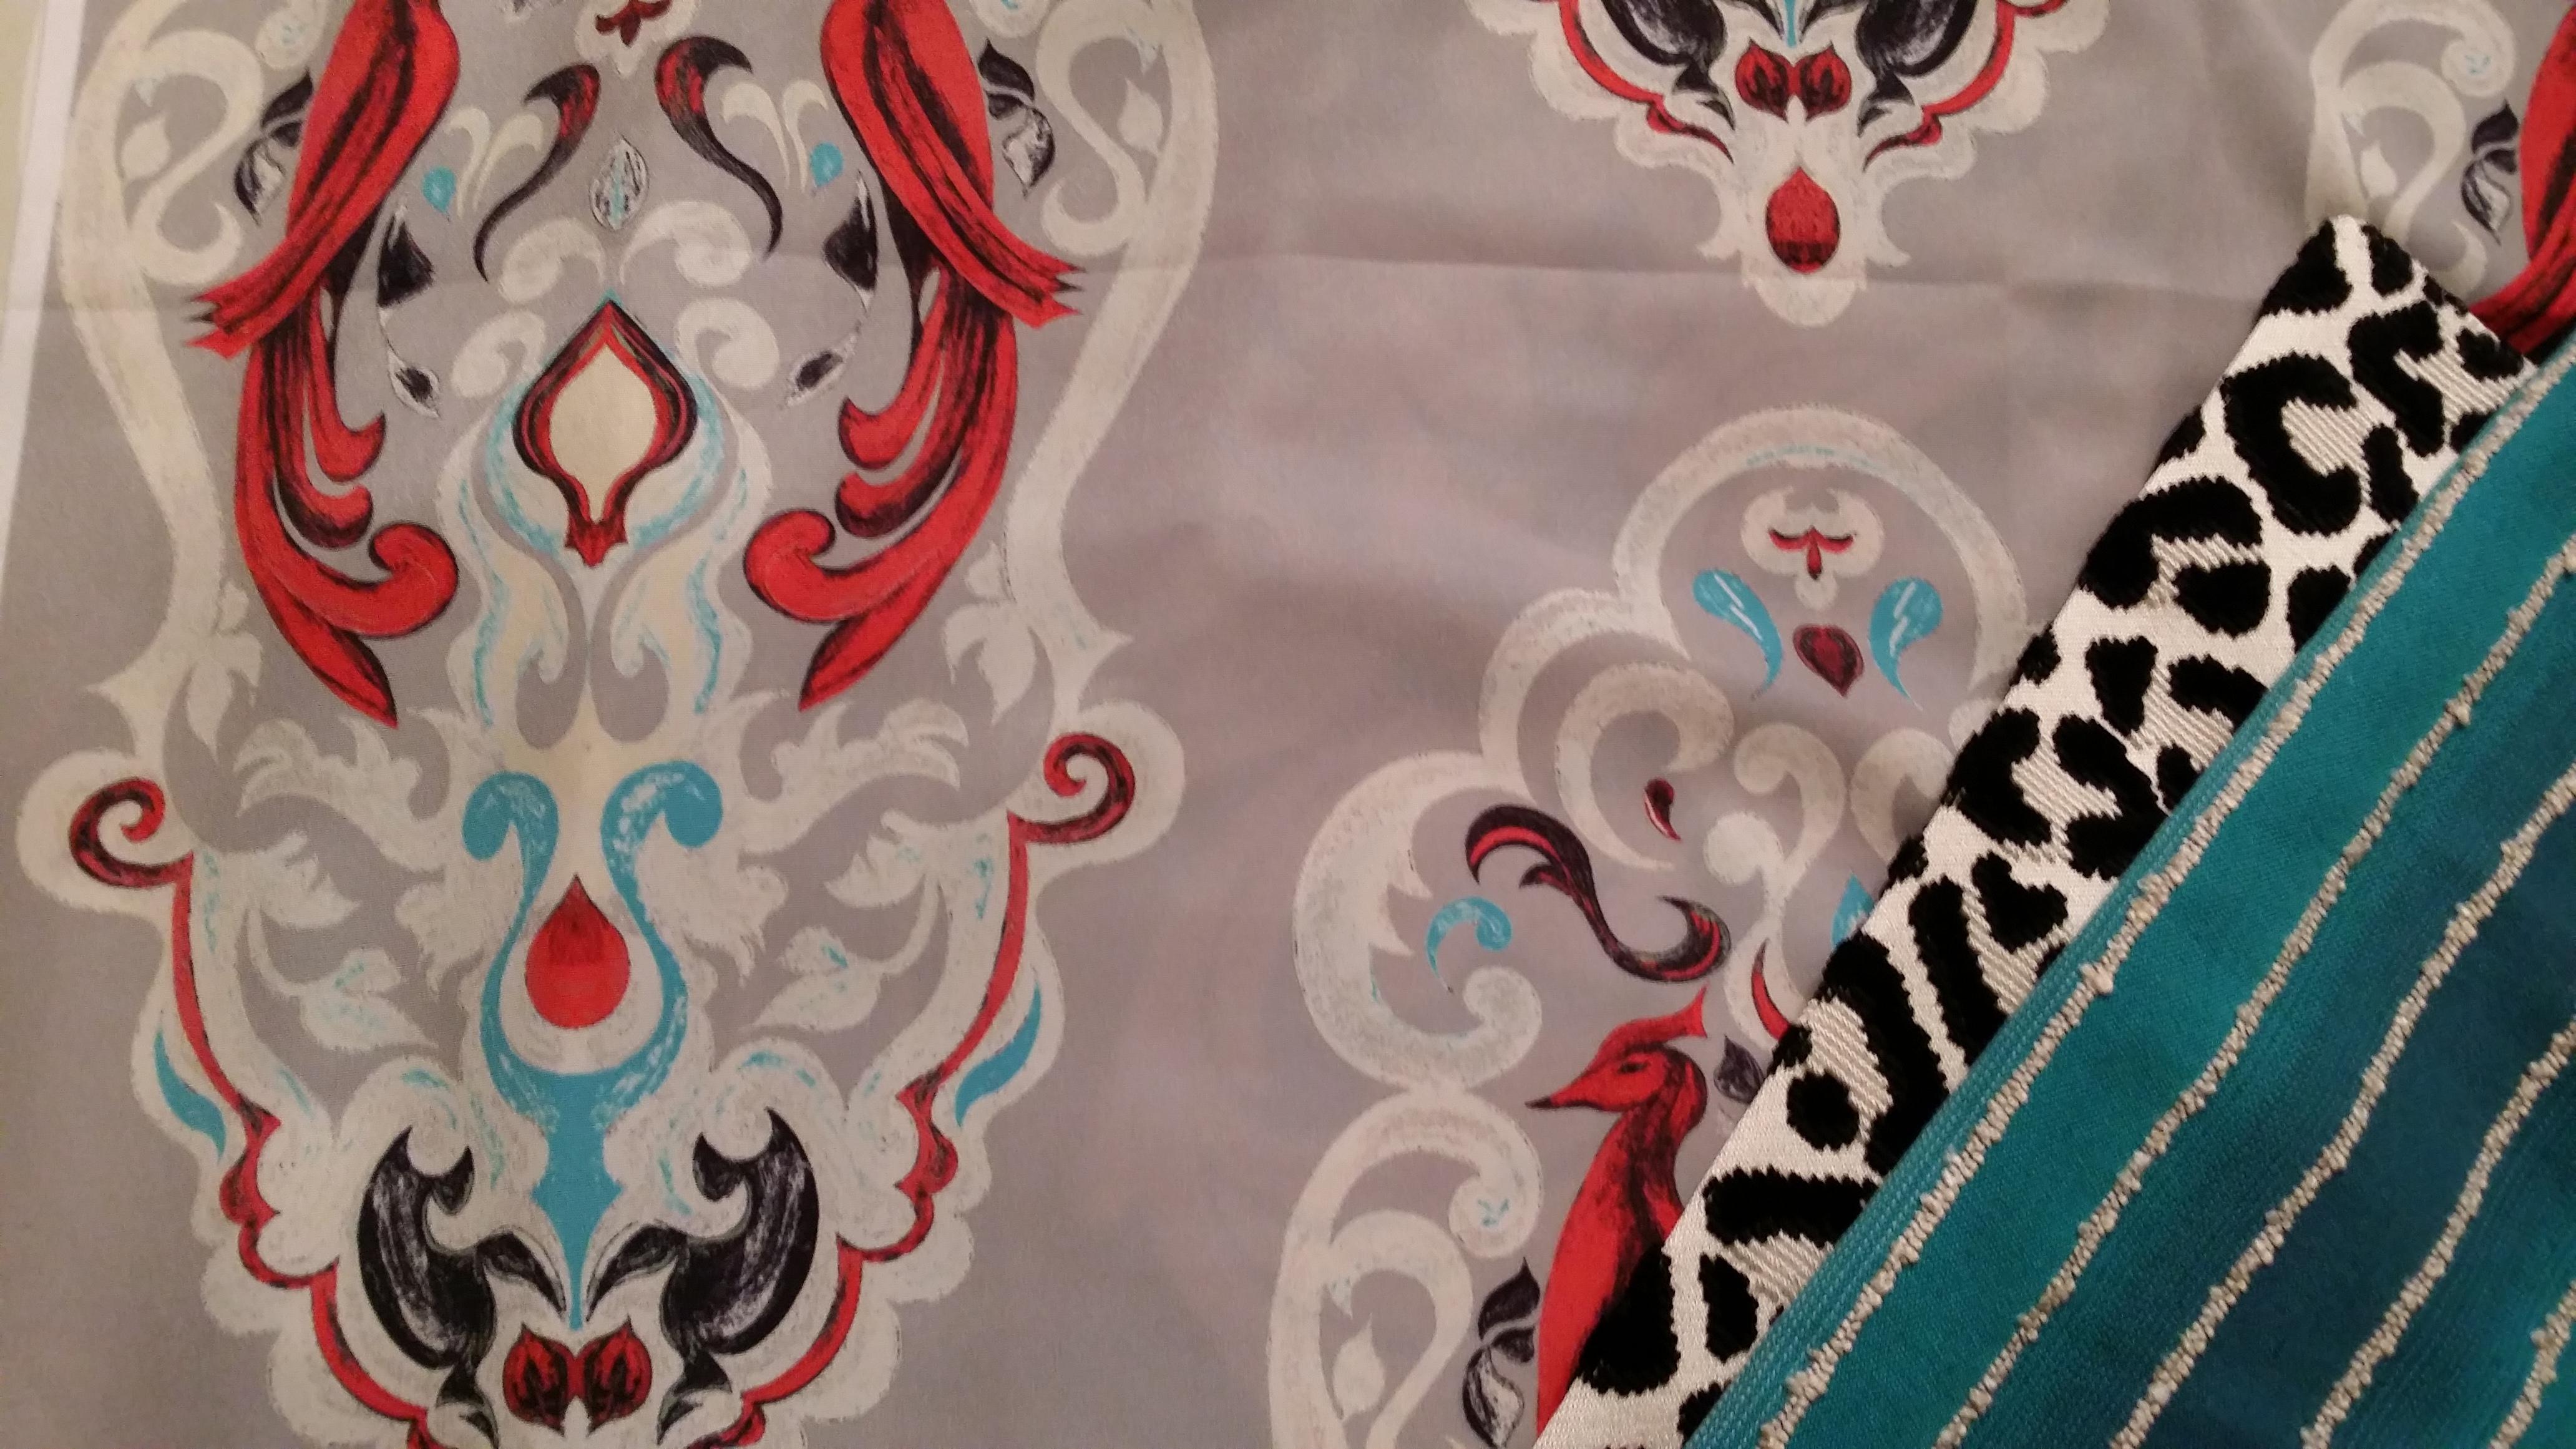 Design Inspired To Create By Circuit Board Fabric Twoboos Spoonflower Azure Elizabeth Vintage Bird In Redl Gray